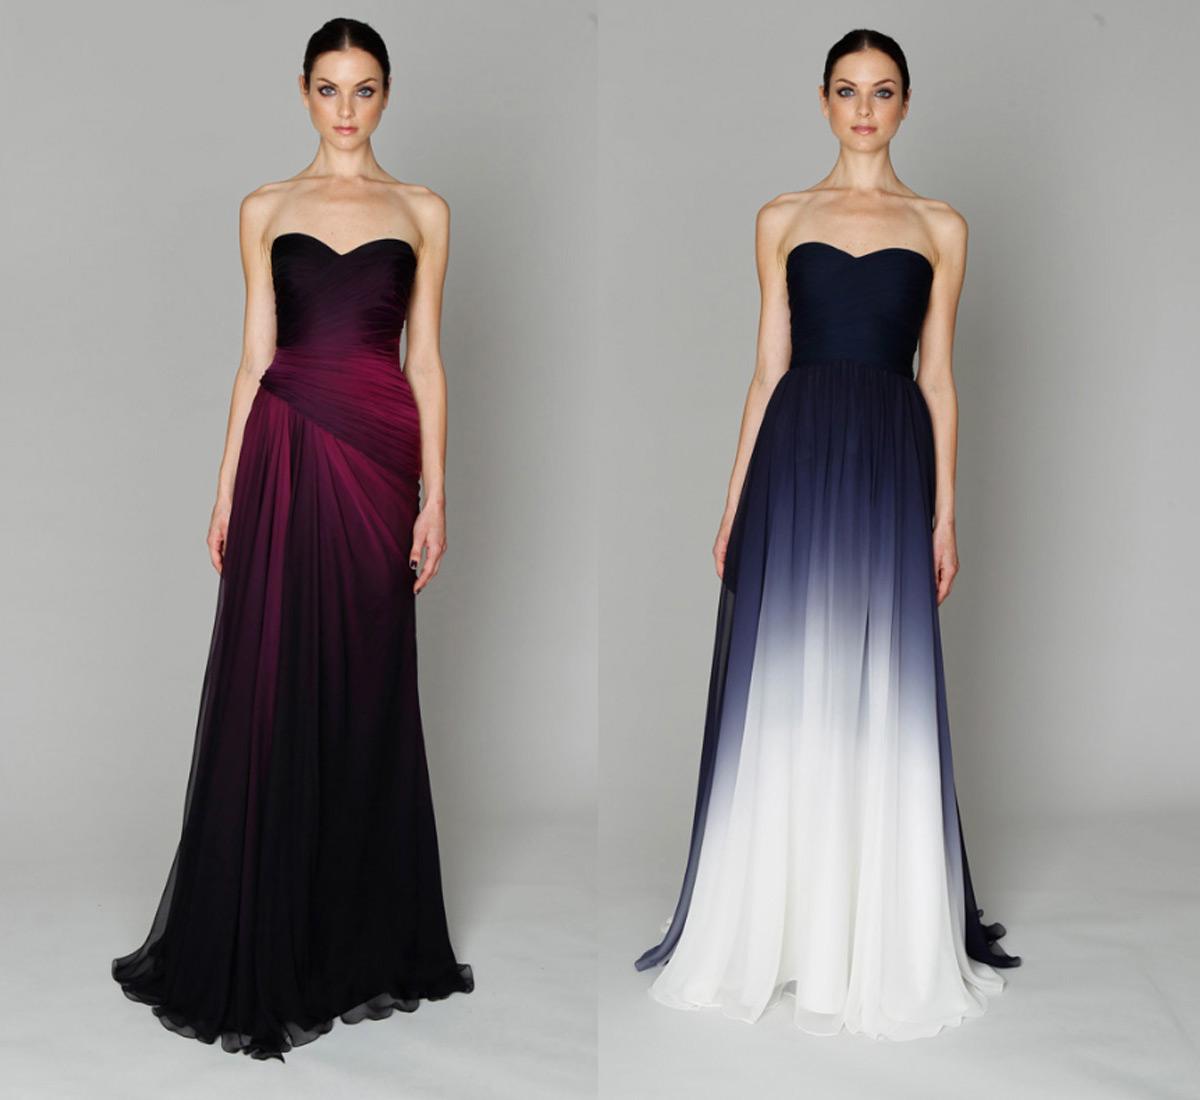 2aec26e9d4d18 lace wedding dresses with sleeves plus size maxi dresses